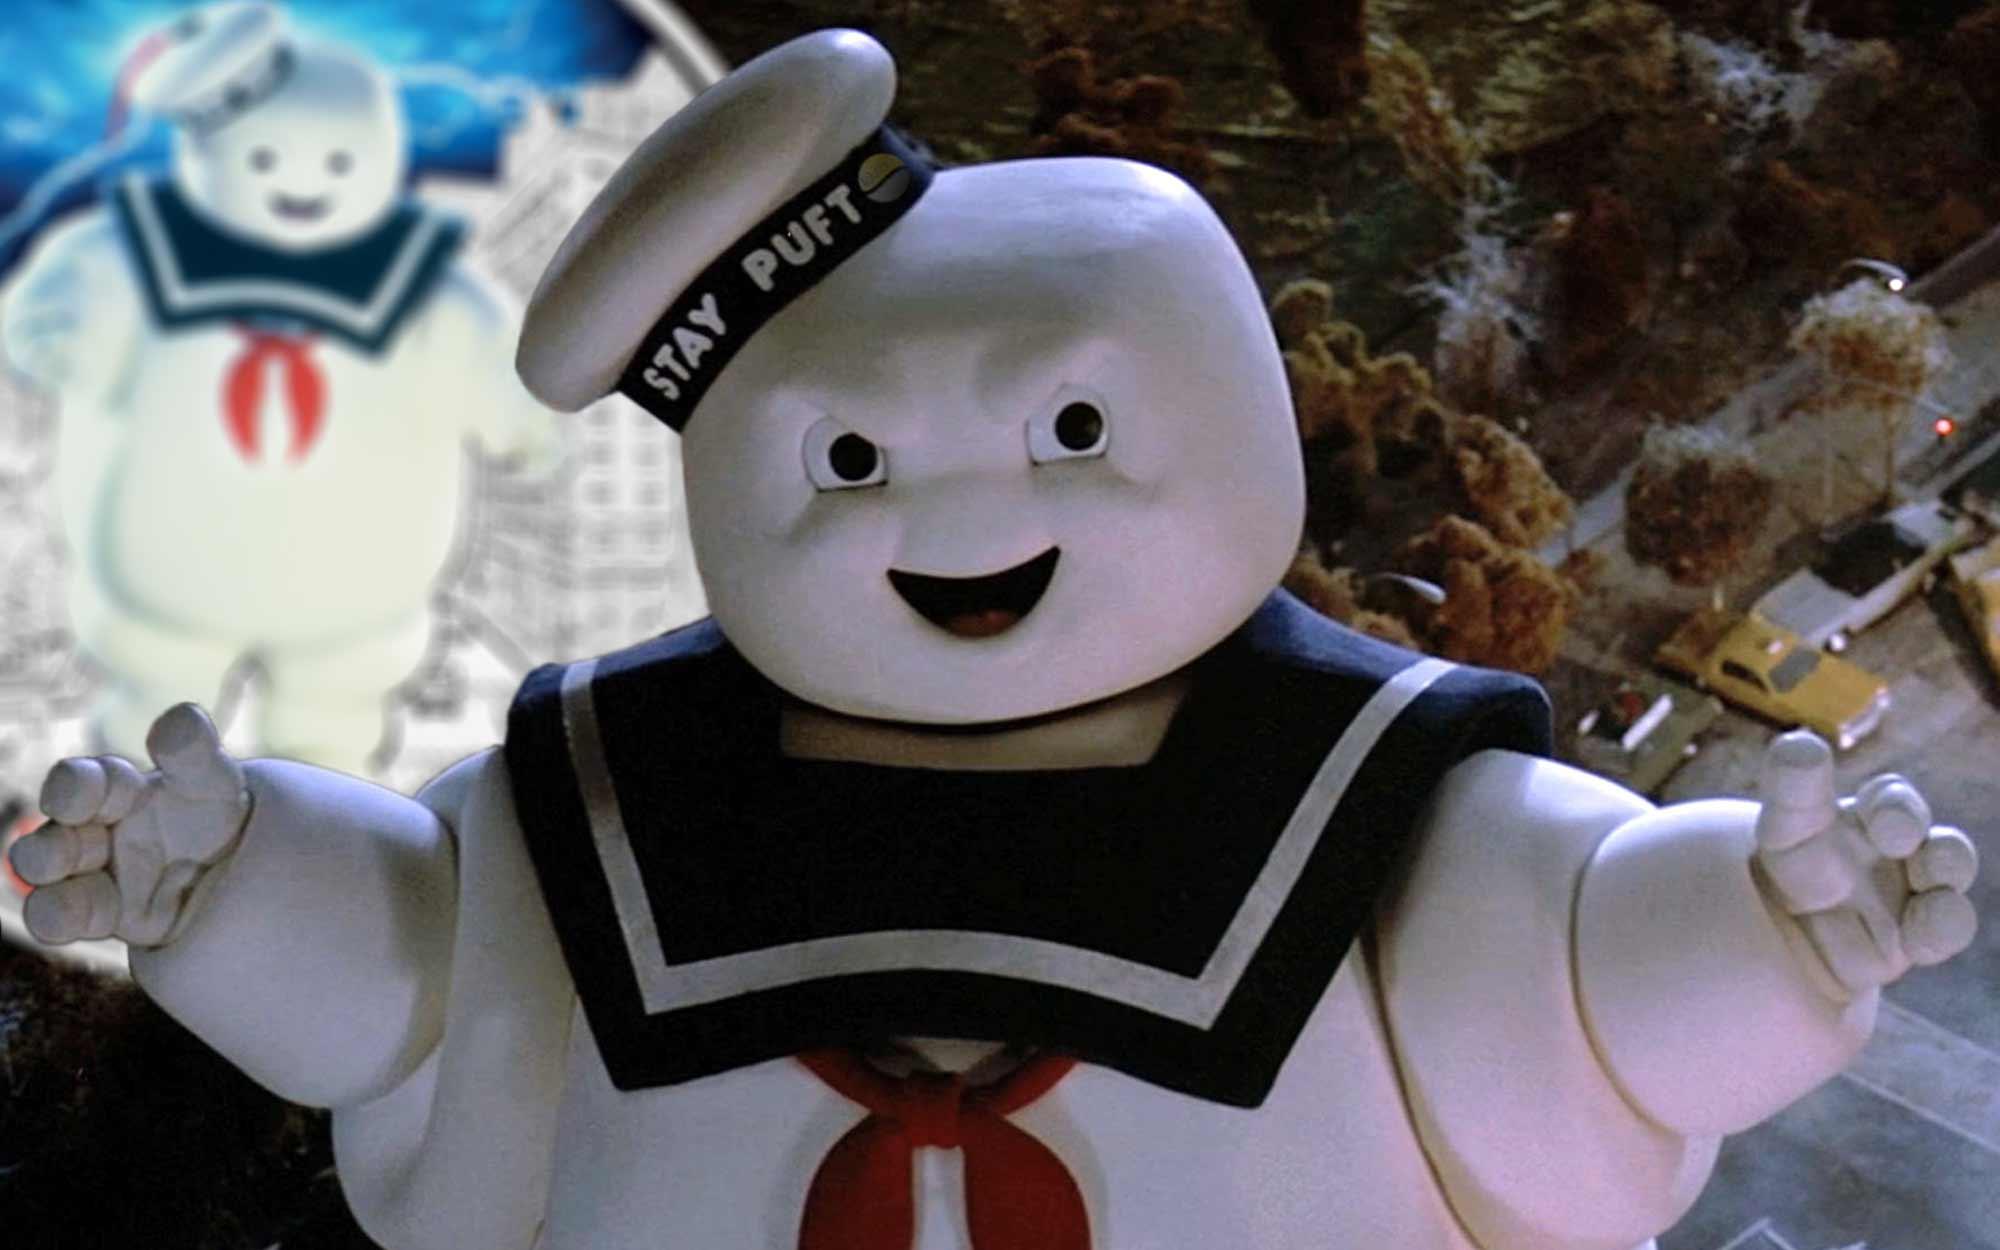 ghostbusters legacy marshmallow man